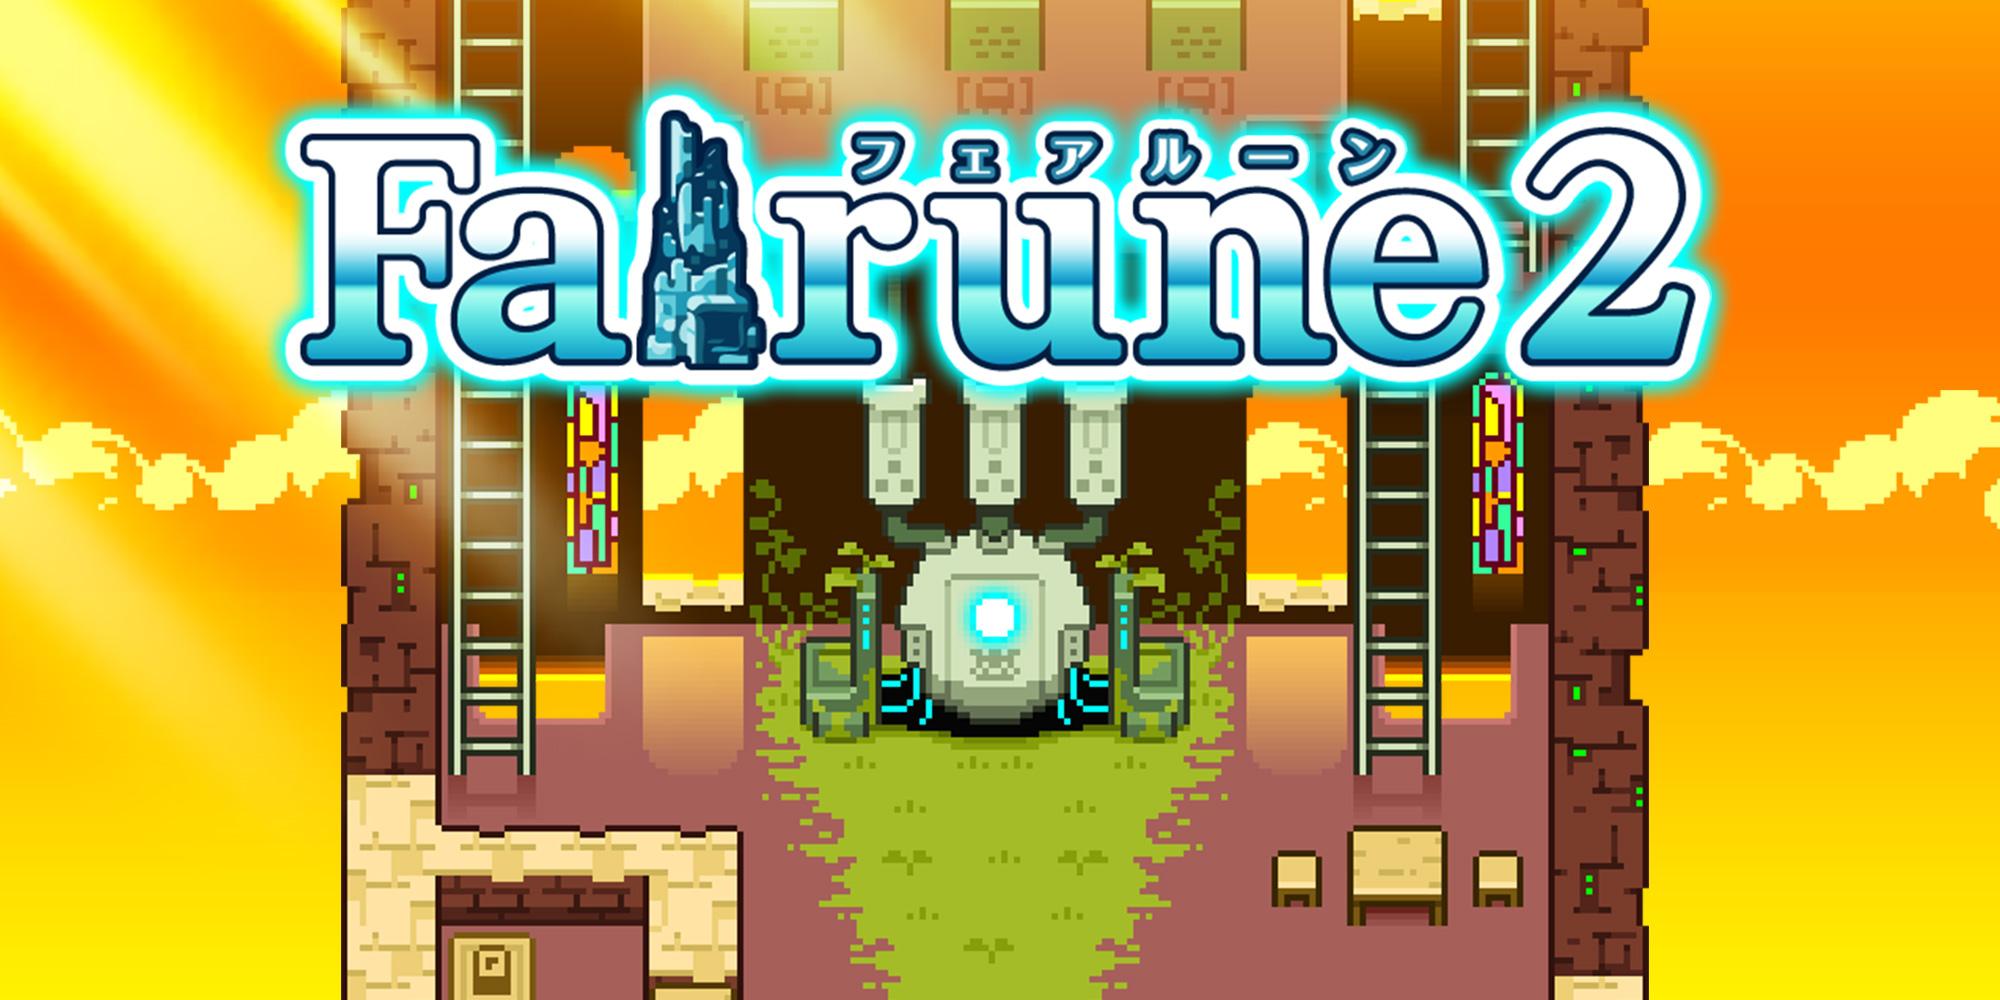 H2x1_3DSDS_Fairune2.jpg